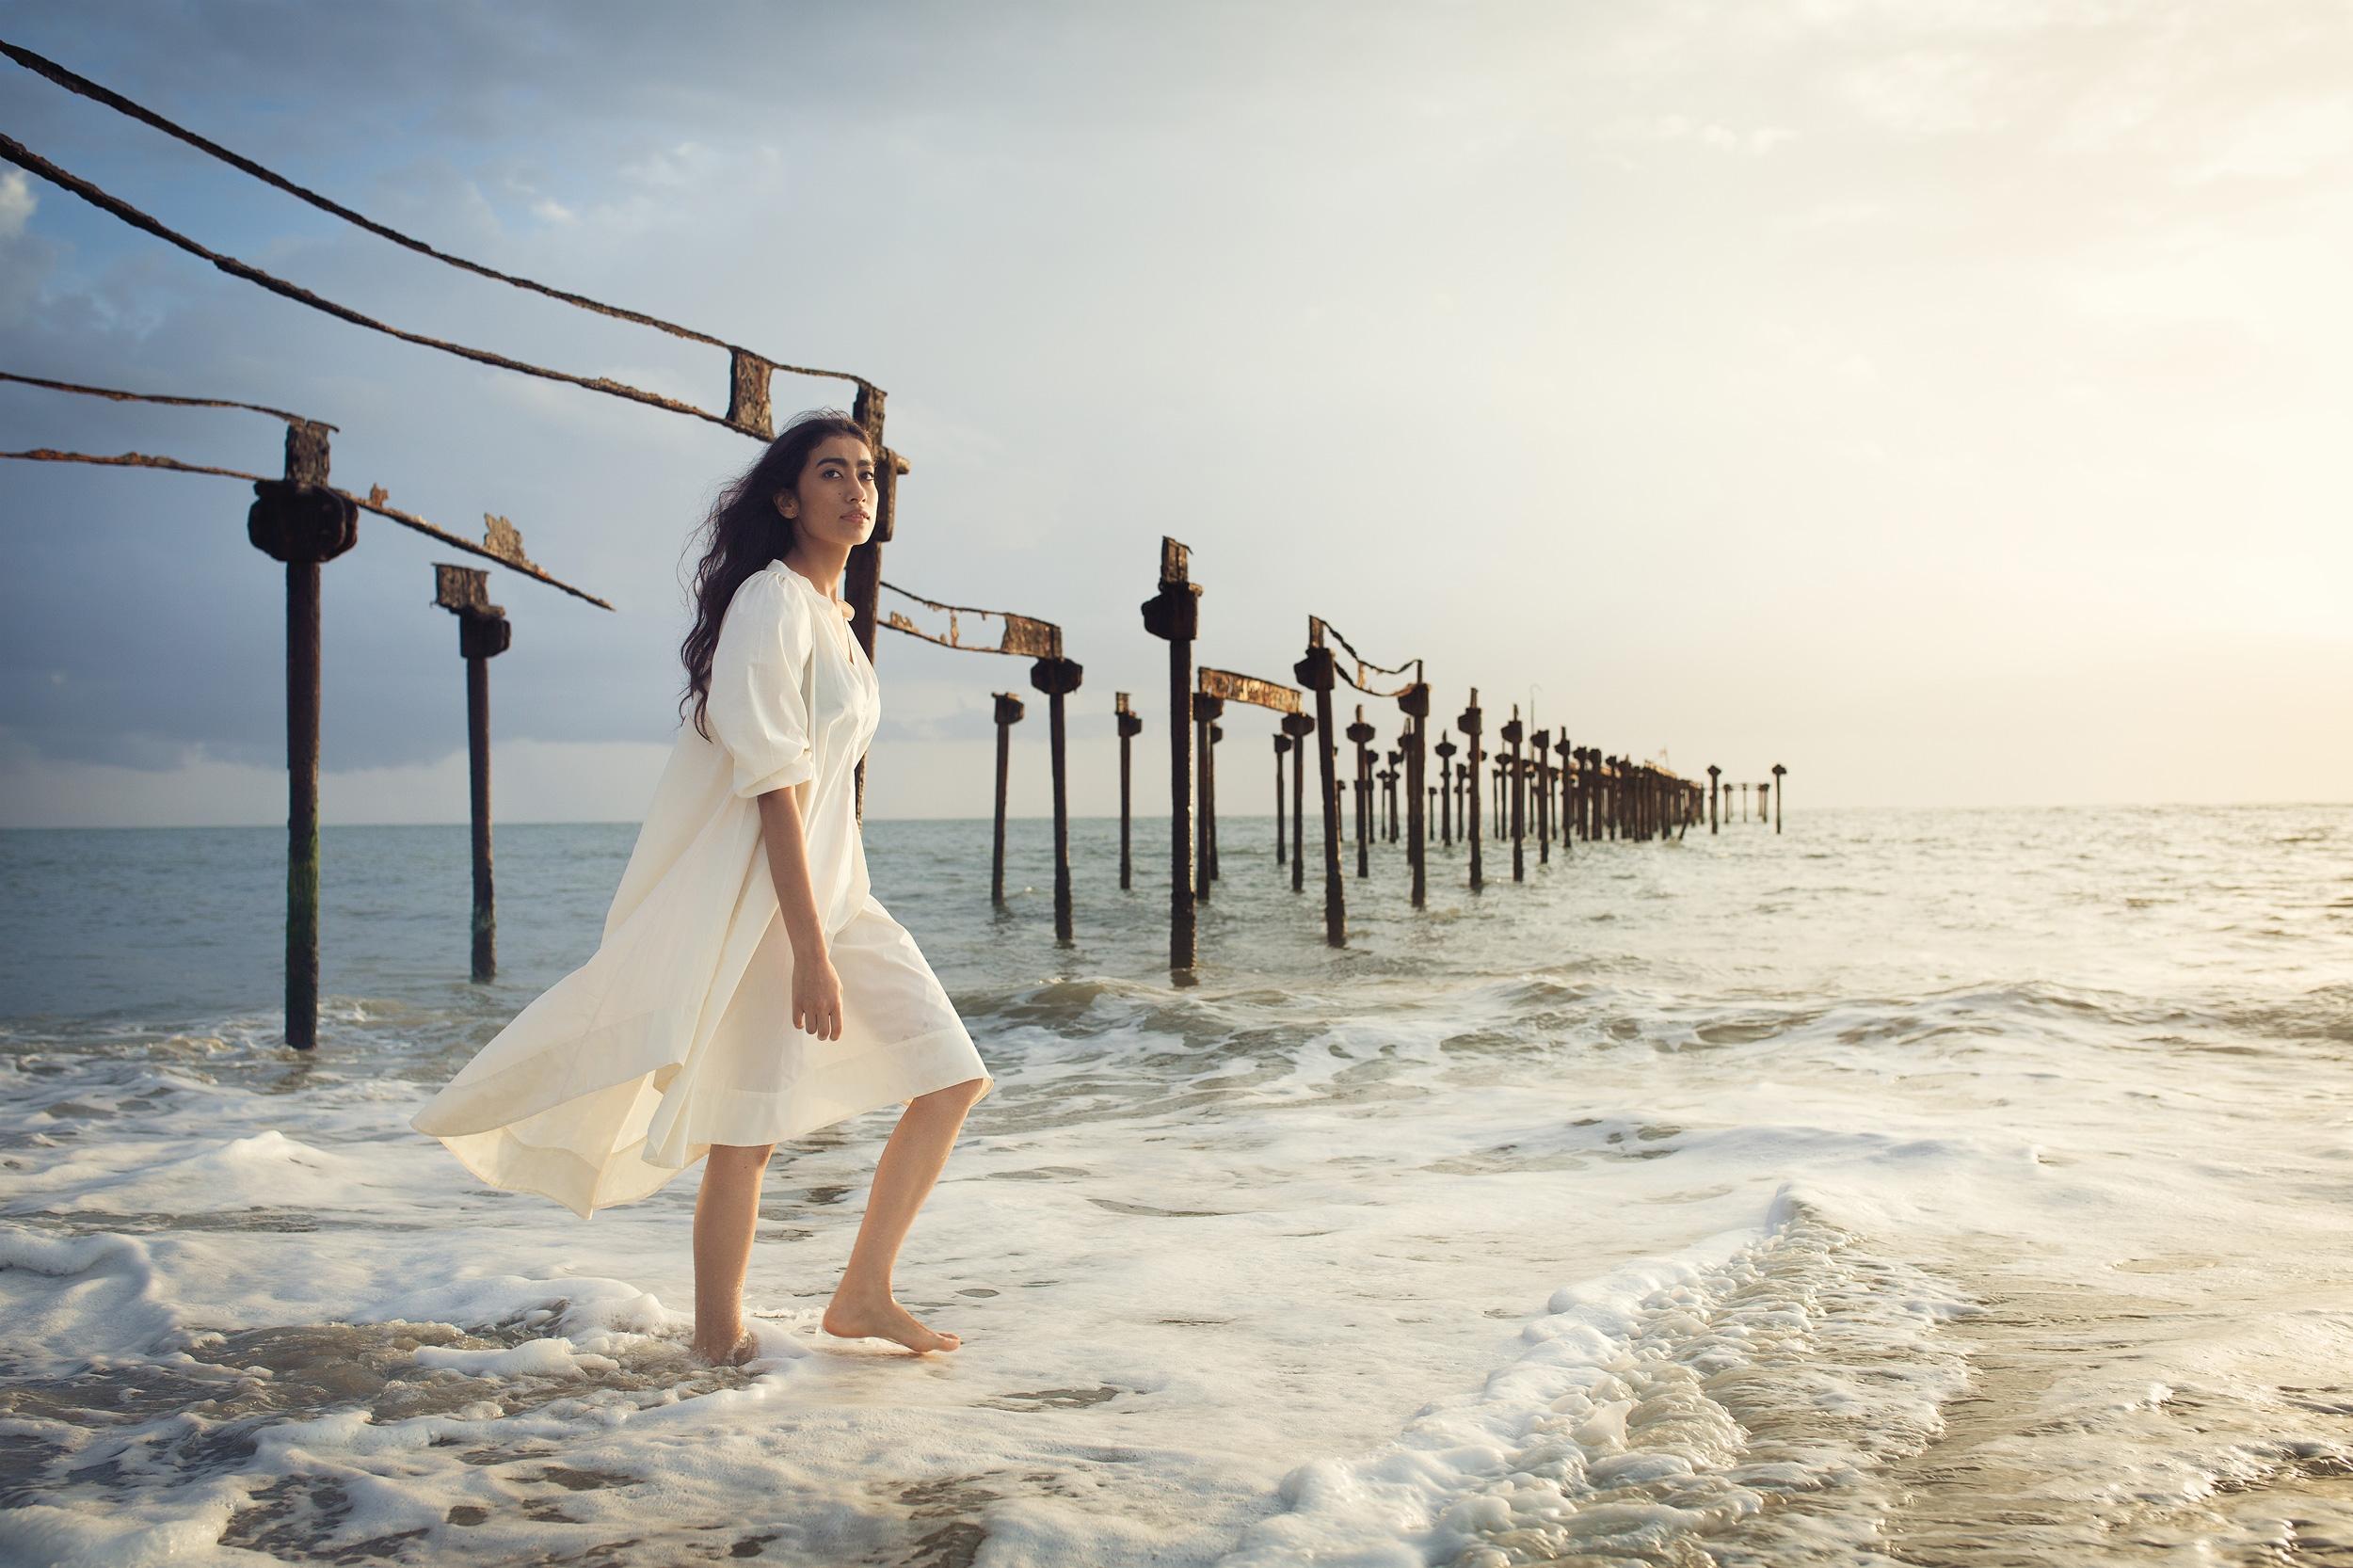 Sindhur_Photography_Fashion_Gloria tep_22.jpg